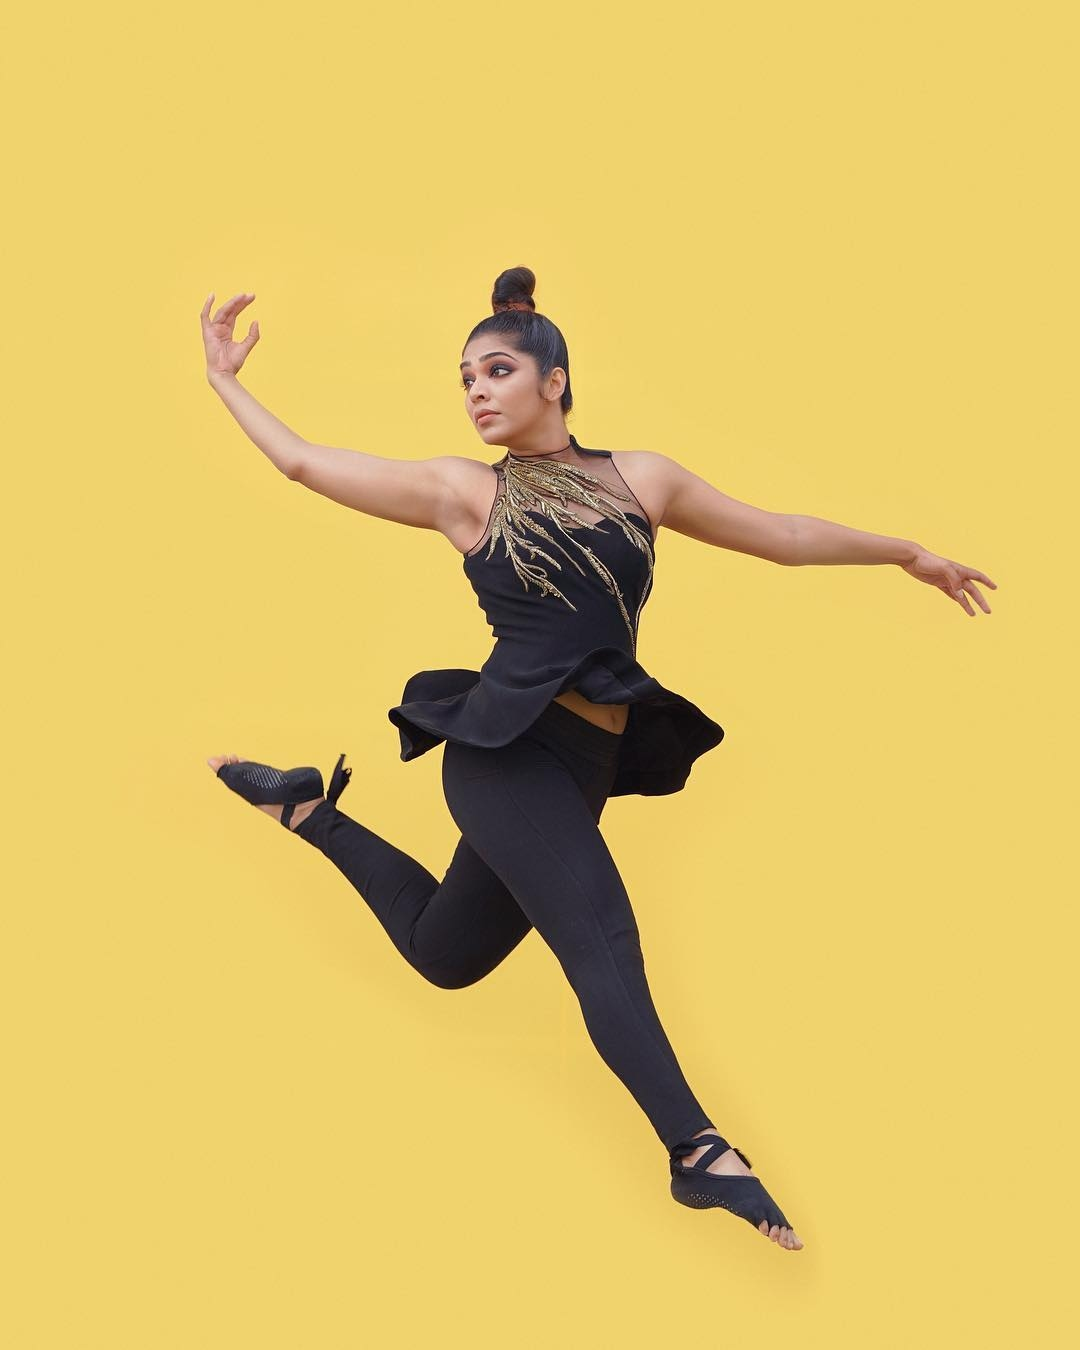 rima Kallingal dance studio shuts down